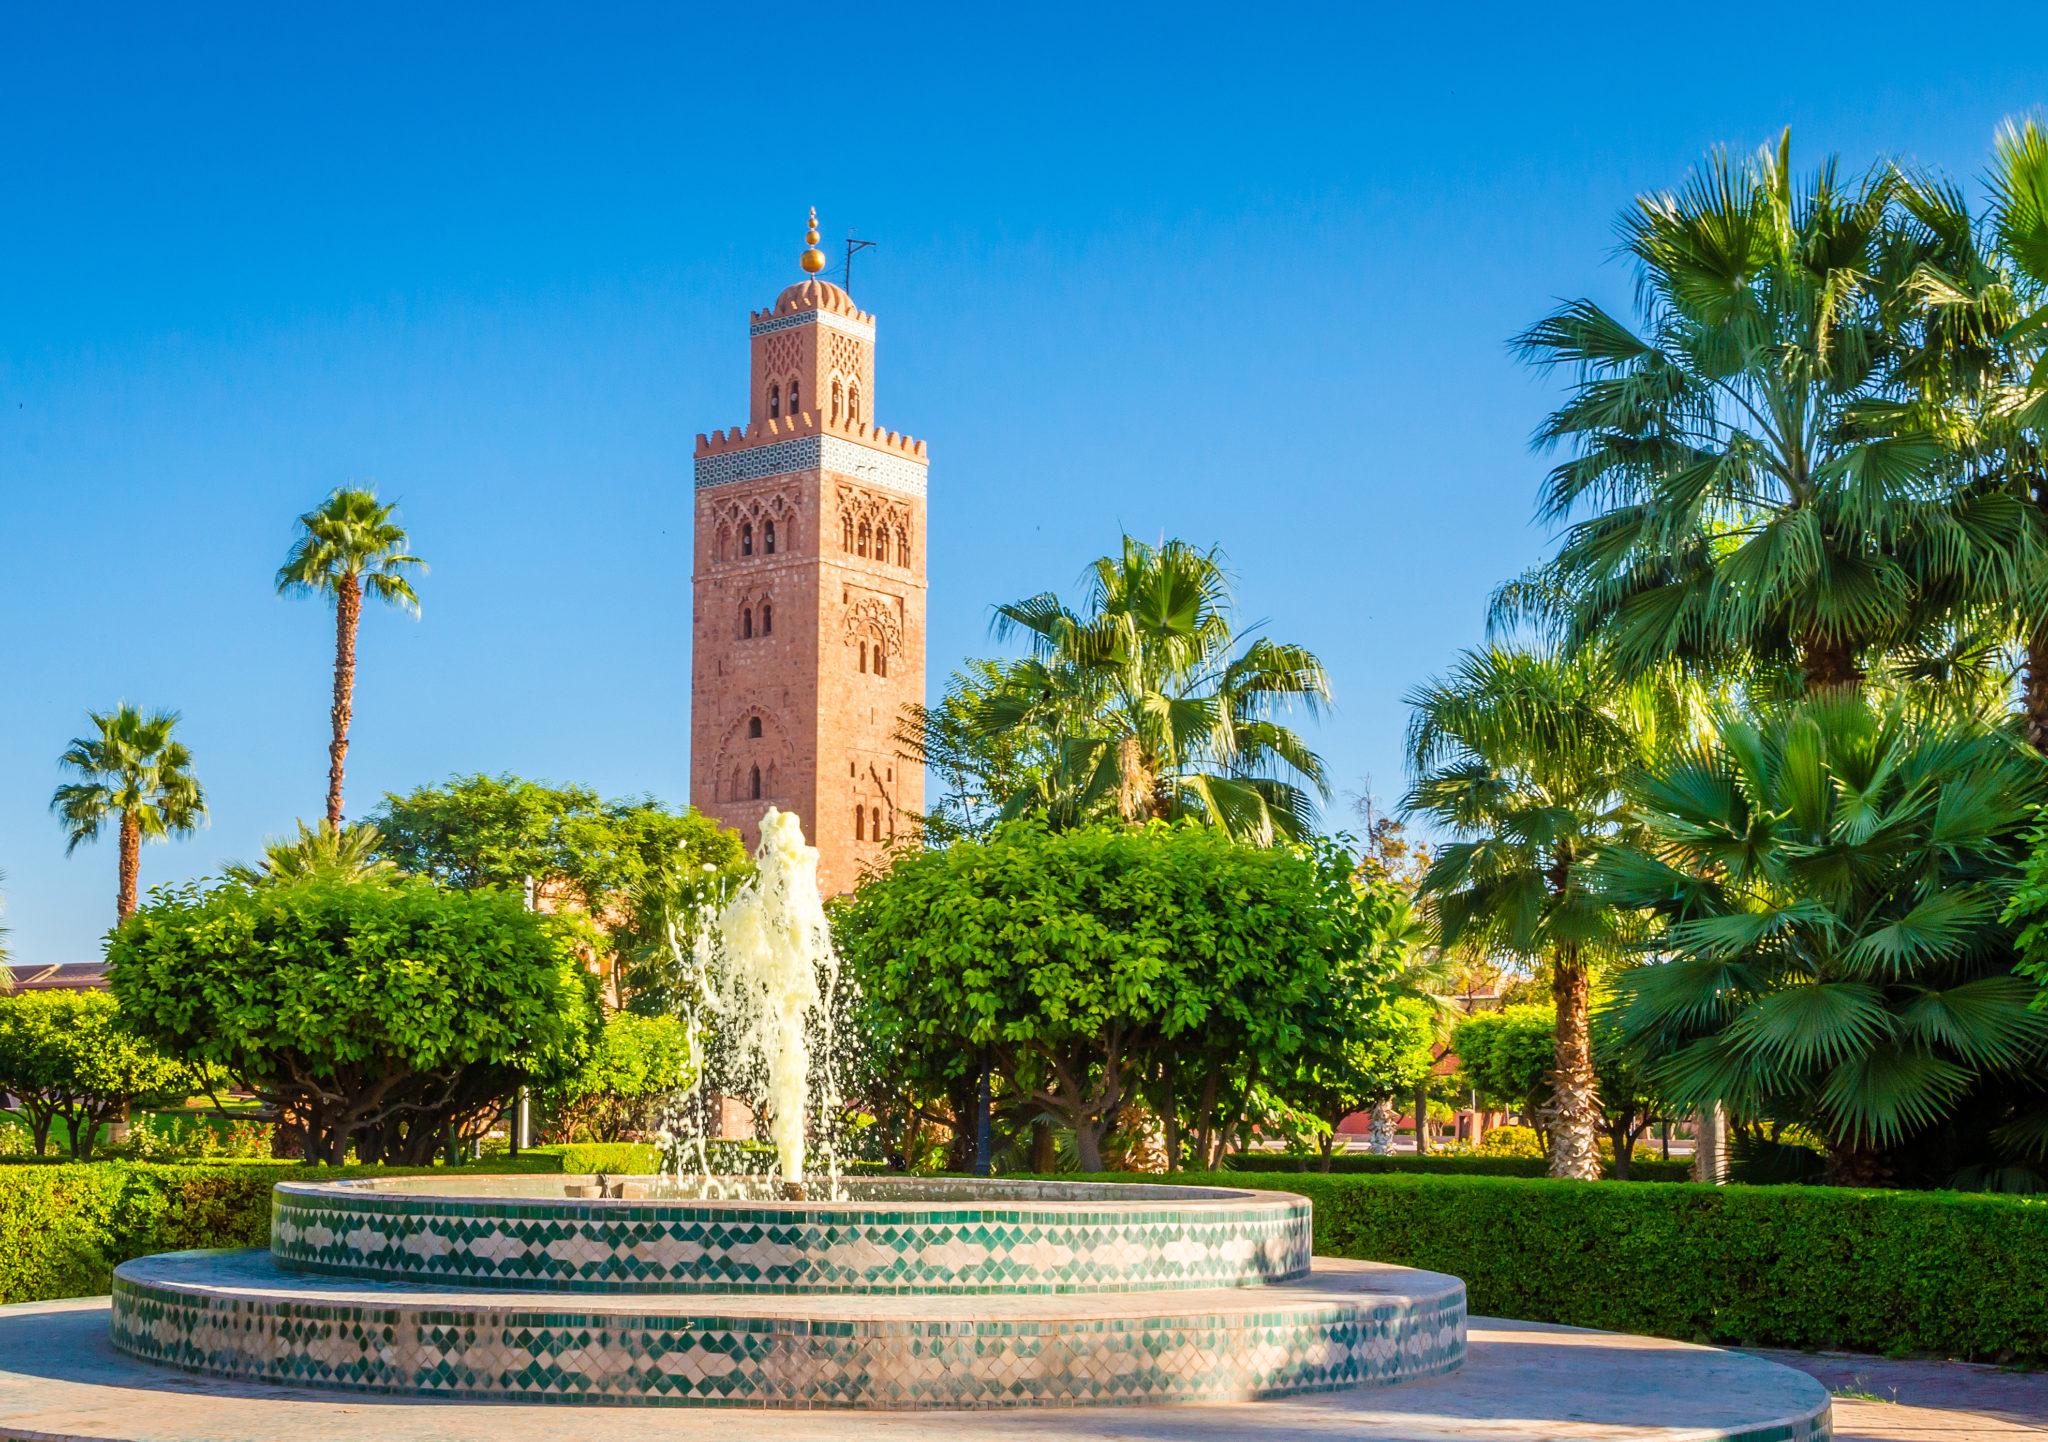 Koutoubia Mosque minaret in old medina of Marrakesh, Morocco